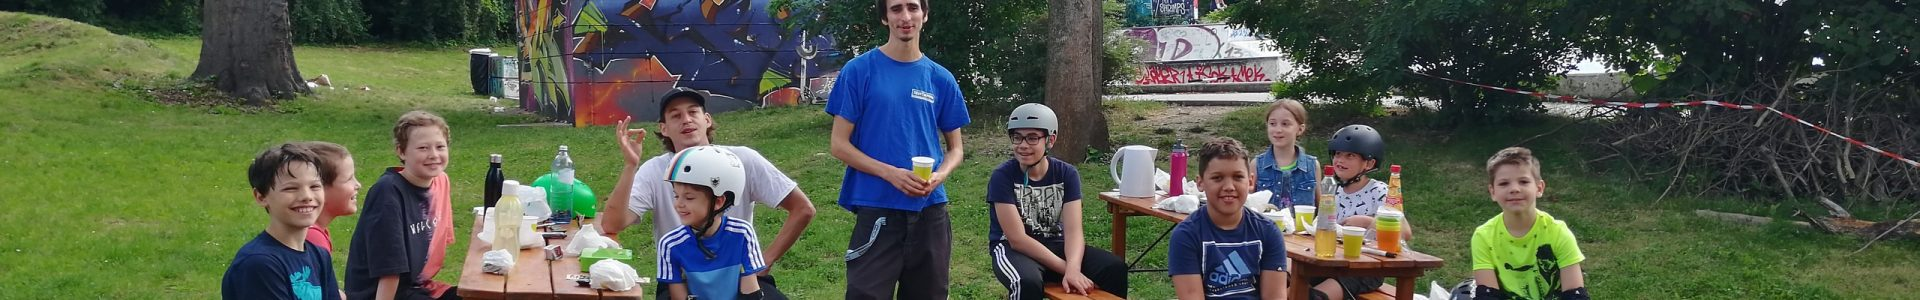 Summer_Skate_Camp